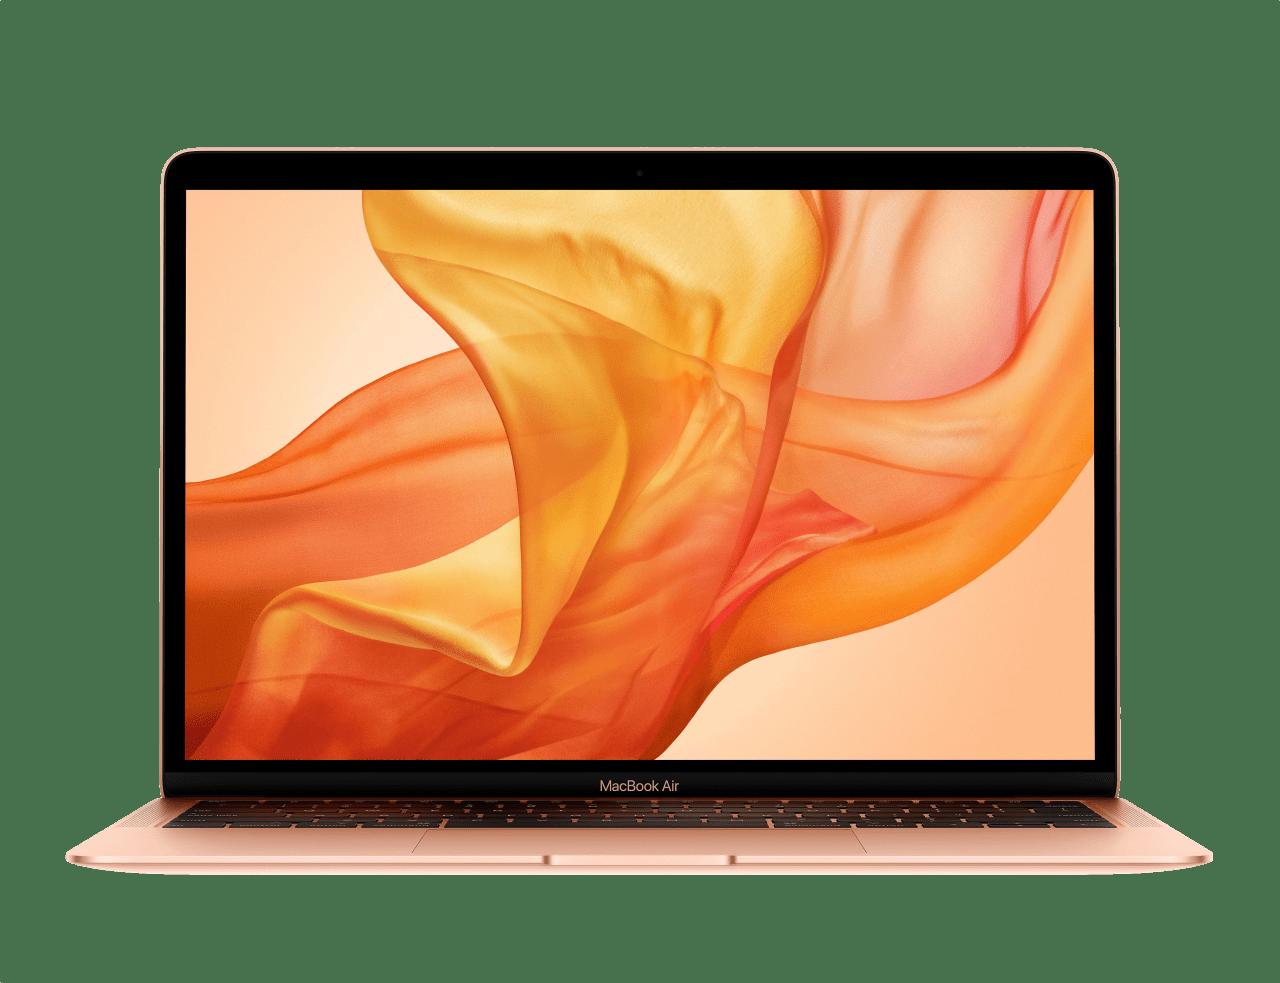 Gold Apple MacBook Air (Mid 2019).1